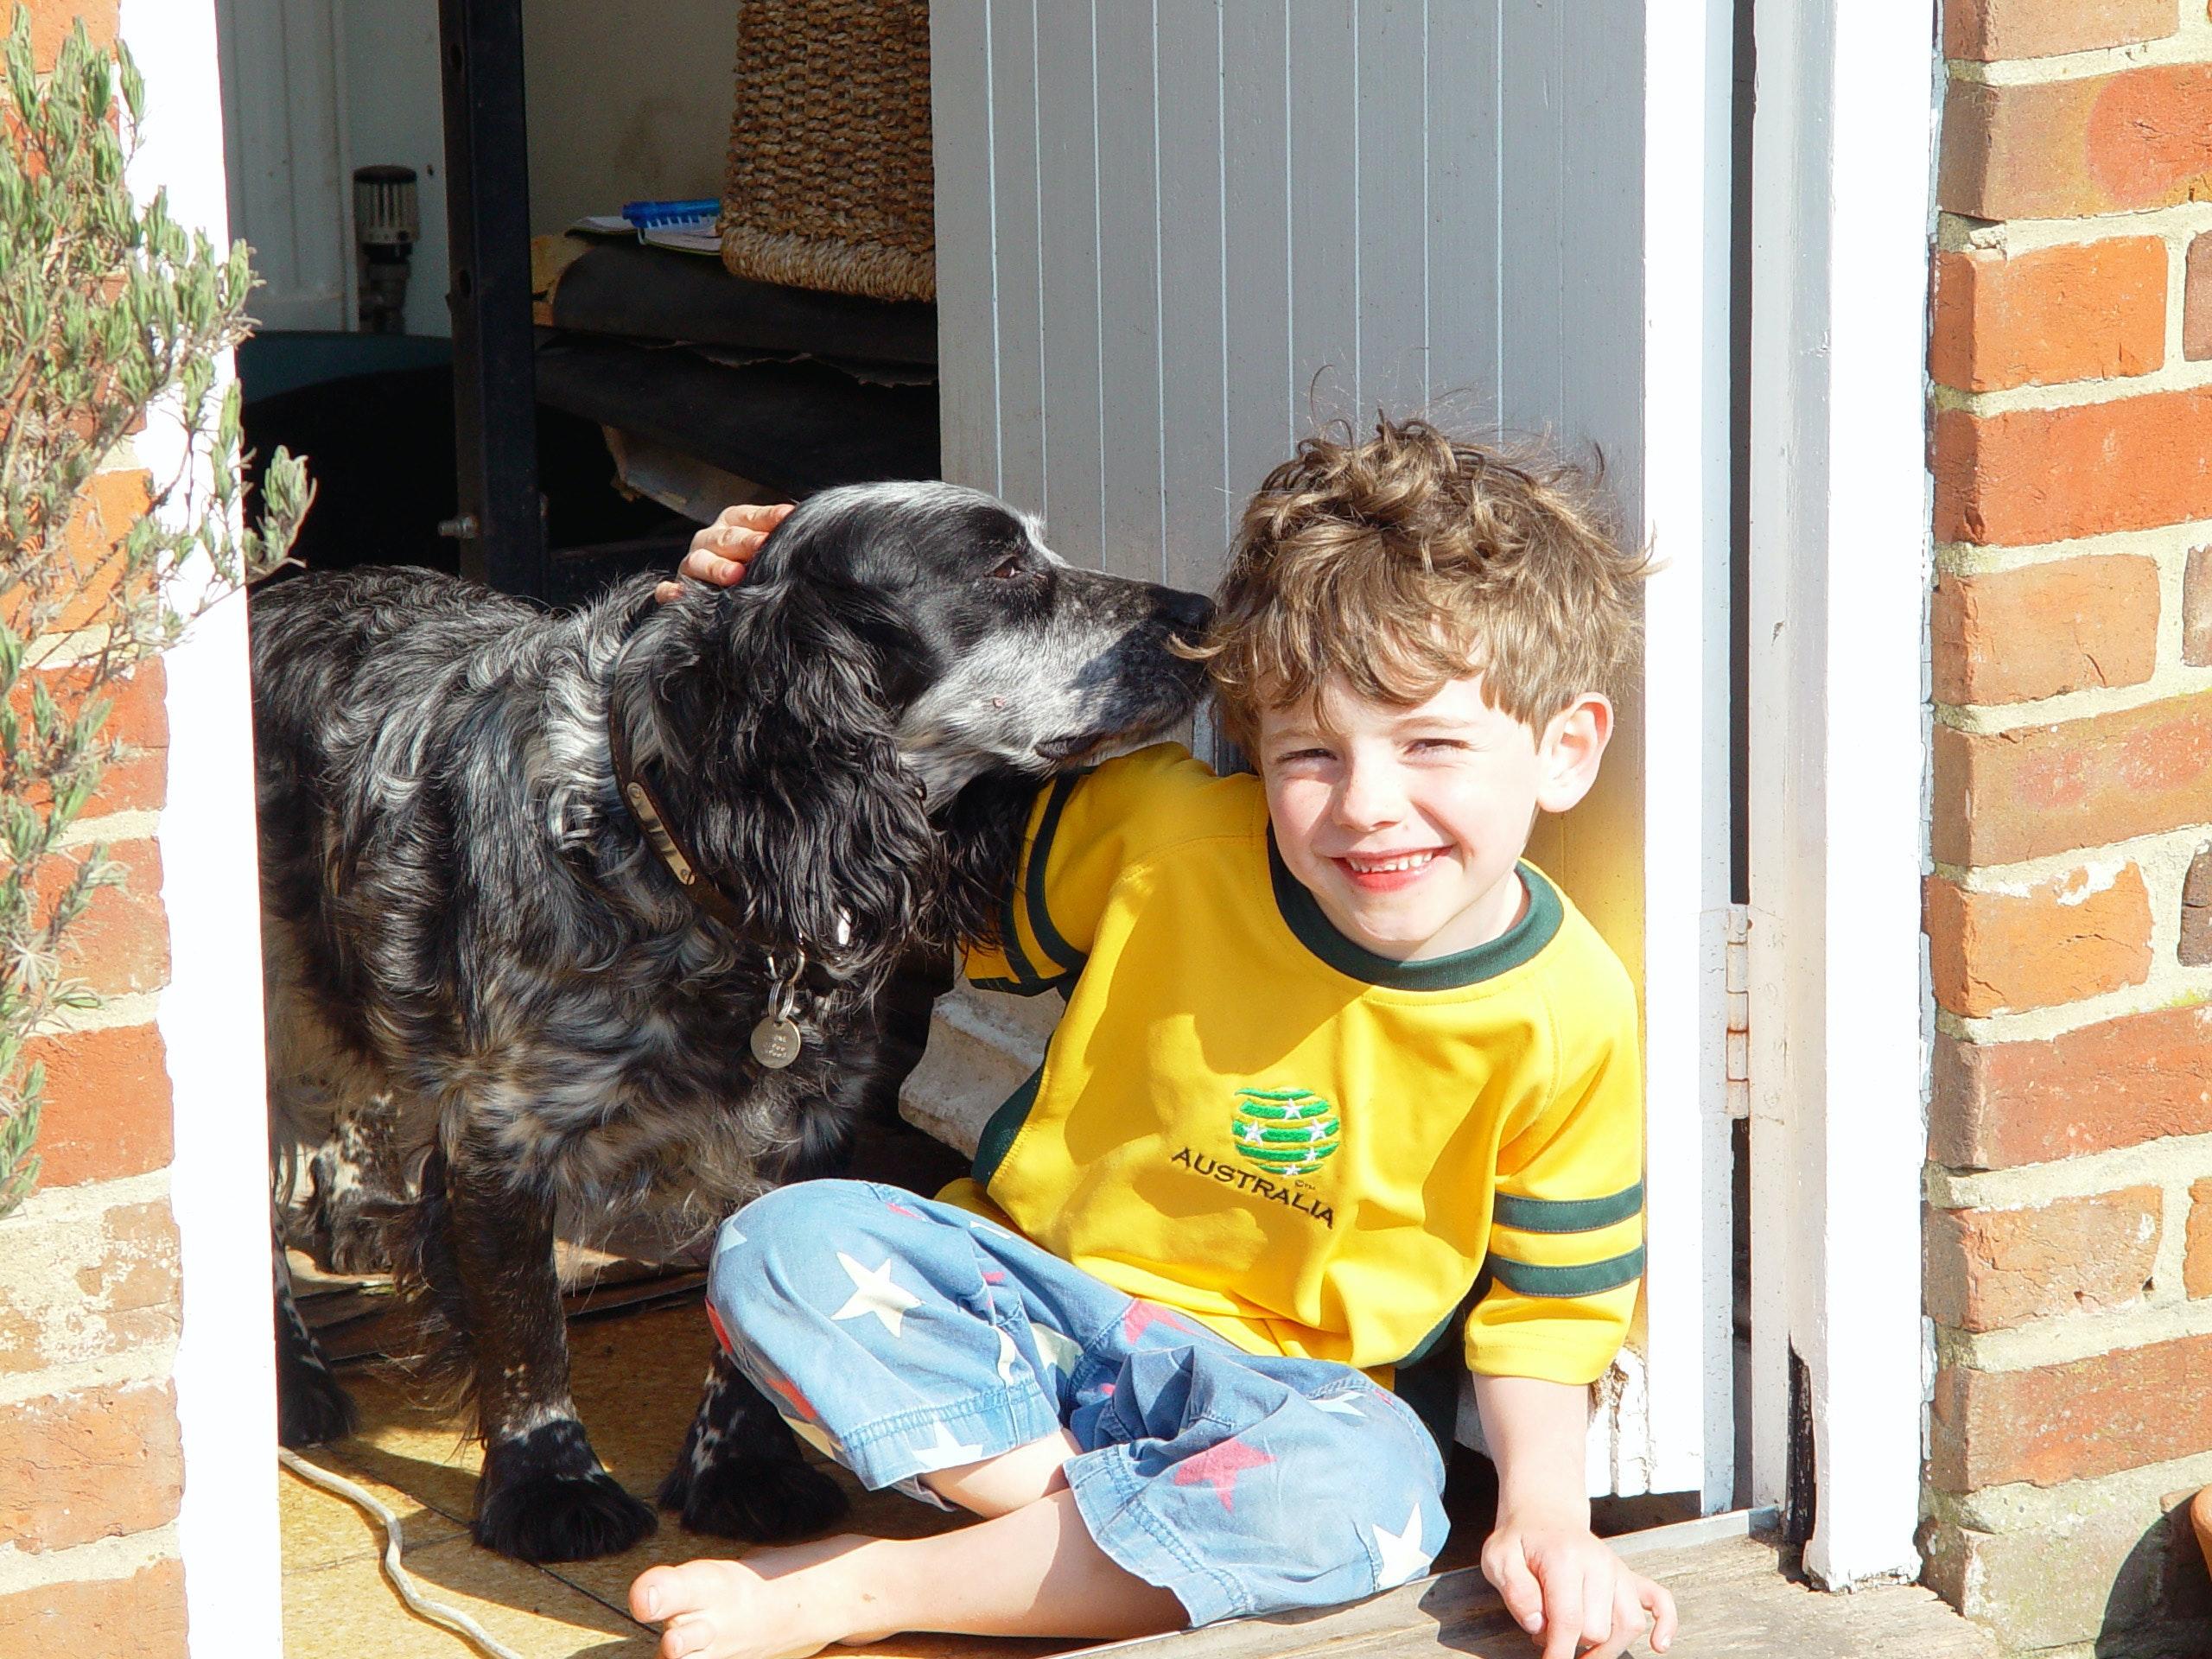 Free stock photo of Boy with dog, friendly dog, kid with dog